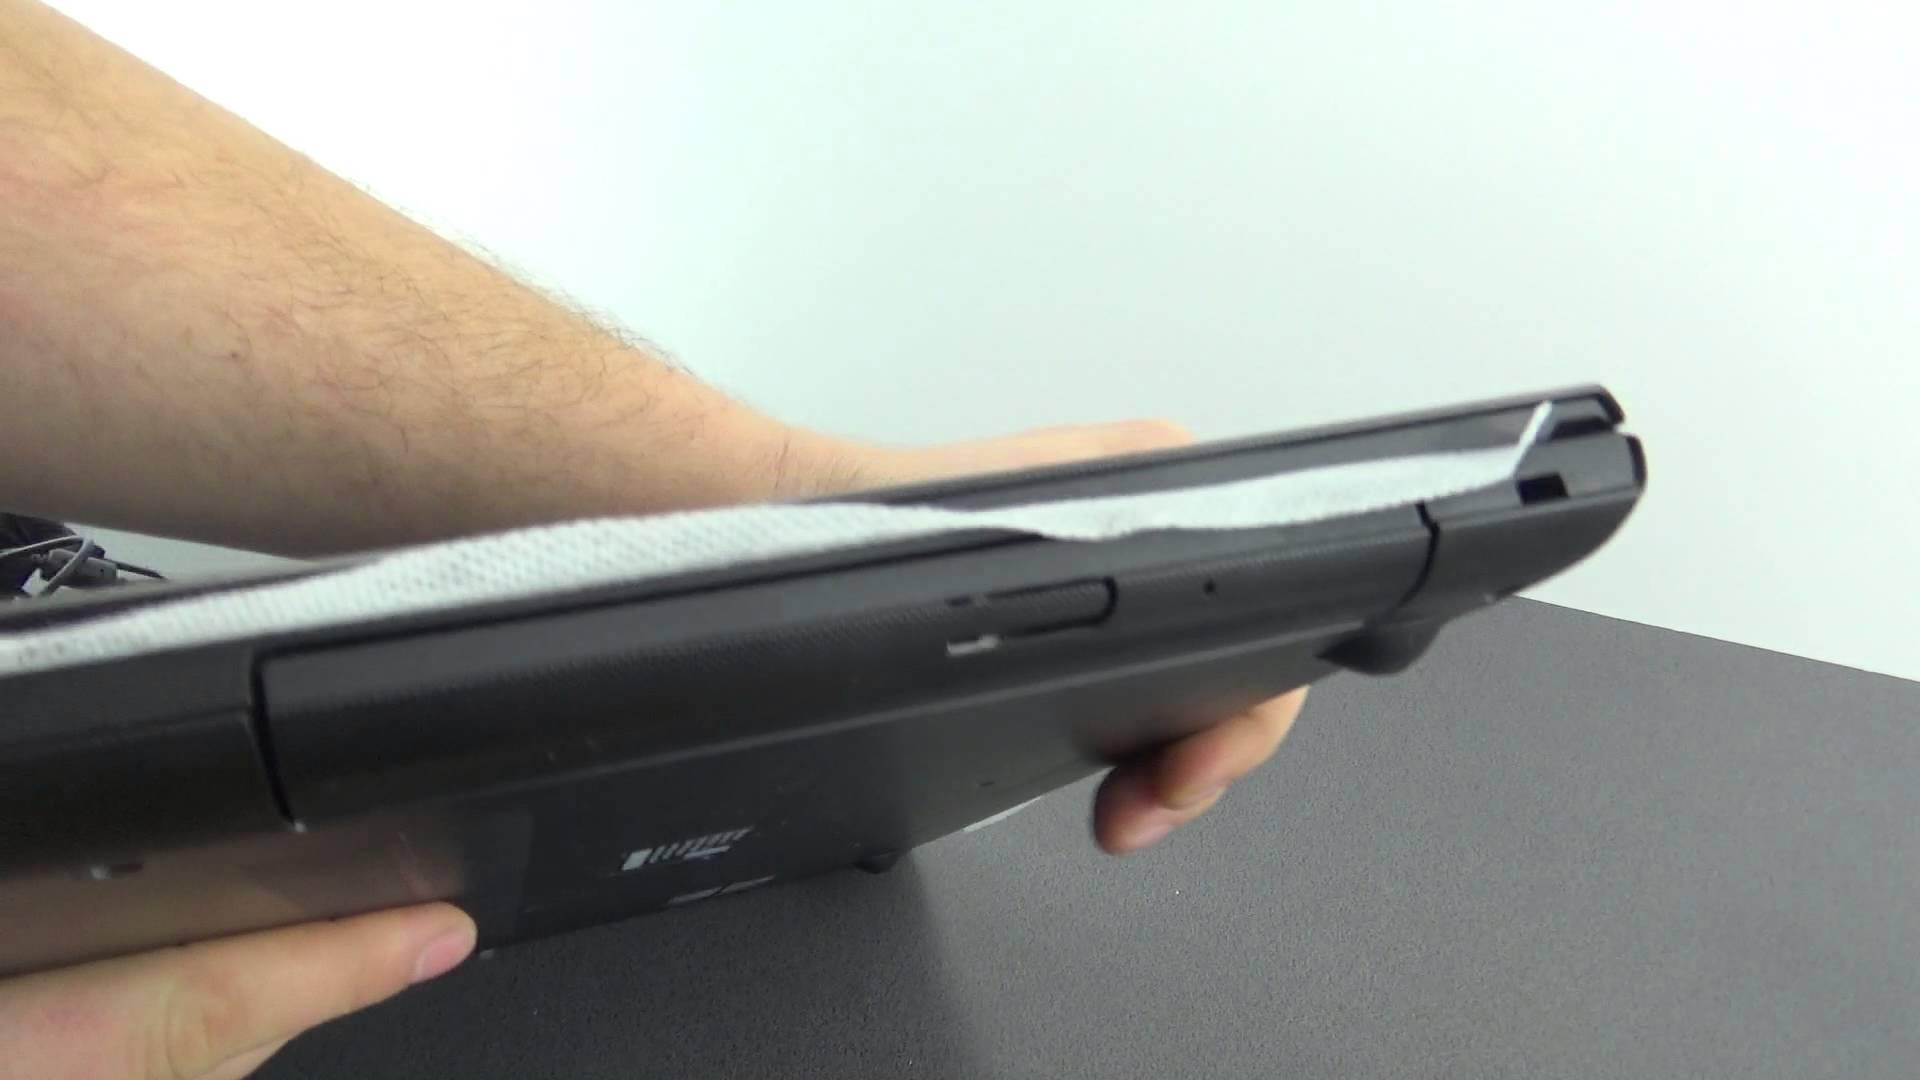 Unboxing Lenovo Ideapad 100 15IBD